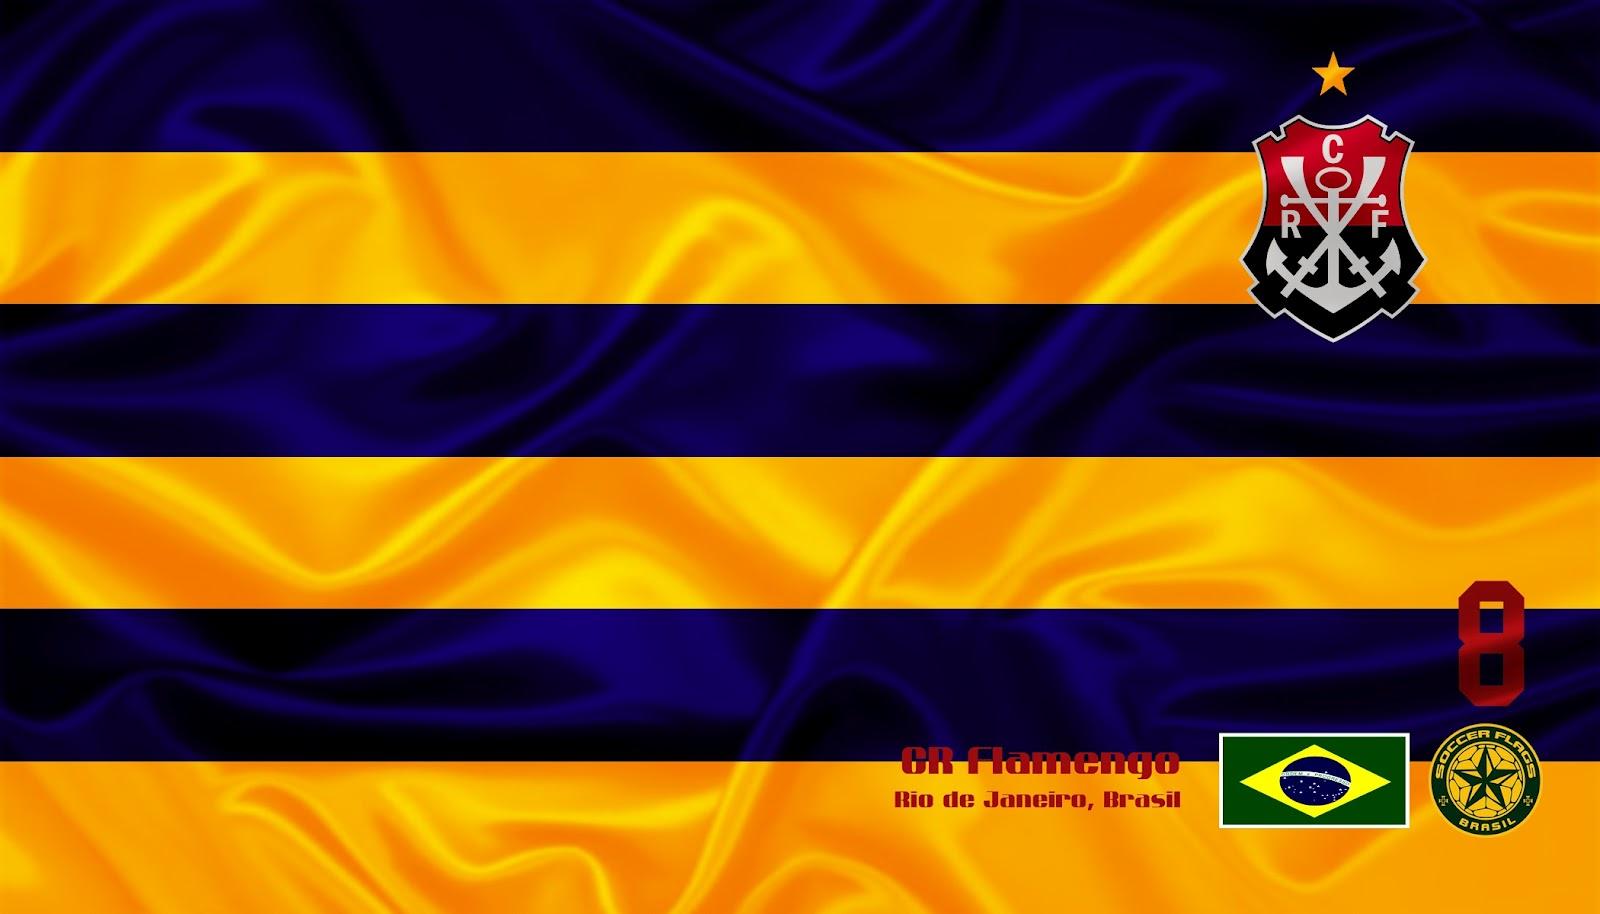 http://2.bp.blogspot.com/-8BQ9EjhBUu0/UCpnRnMCUhI/AAAAAAAACcA/uDWb9lGfrFs/s1600/Flamengo+(10).jpg